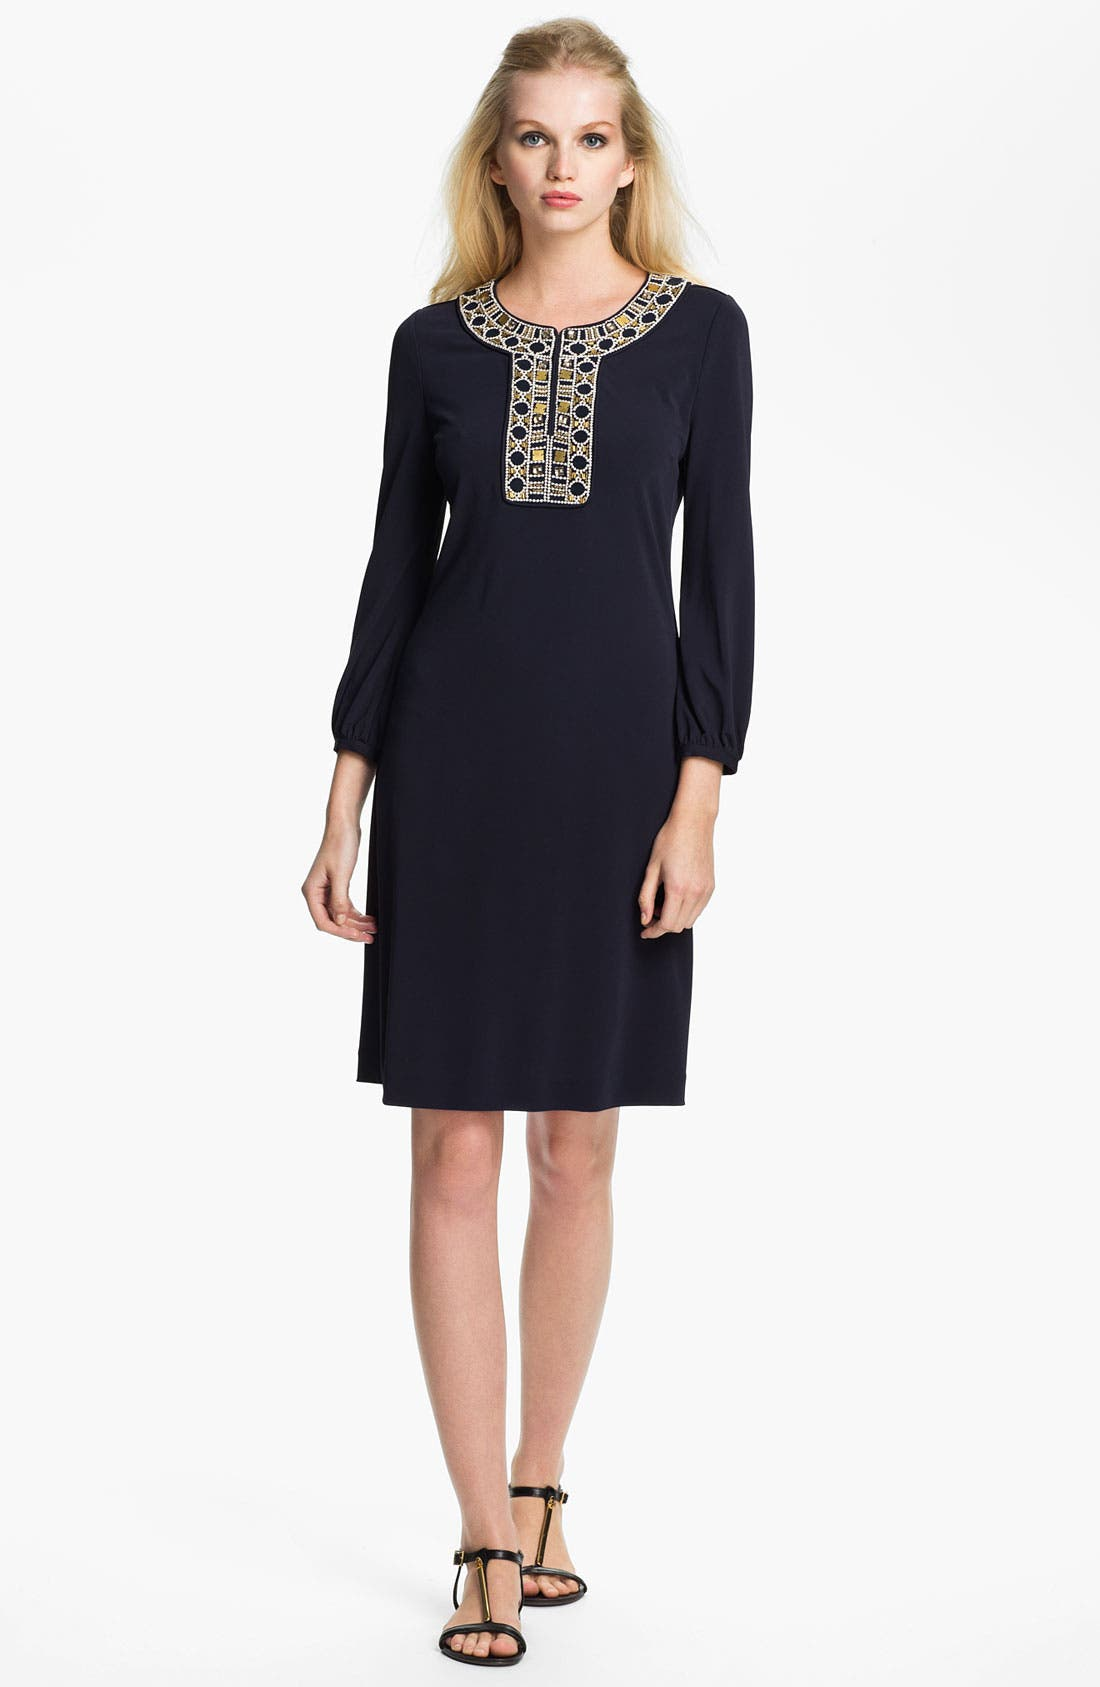 Alternate Image 1 Selected - Tory Burch 'Carissa' Embellished Sheath Dress